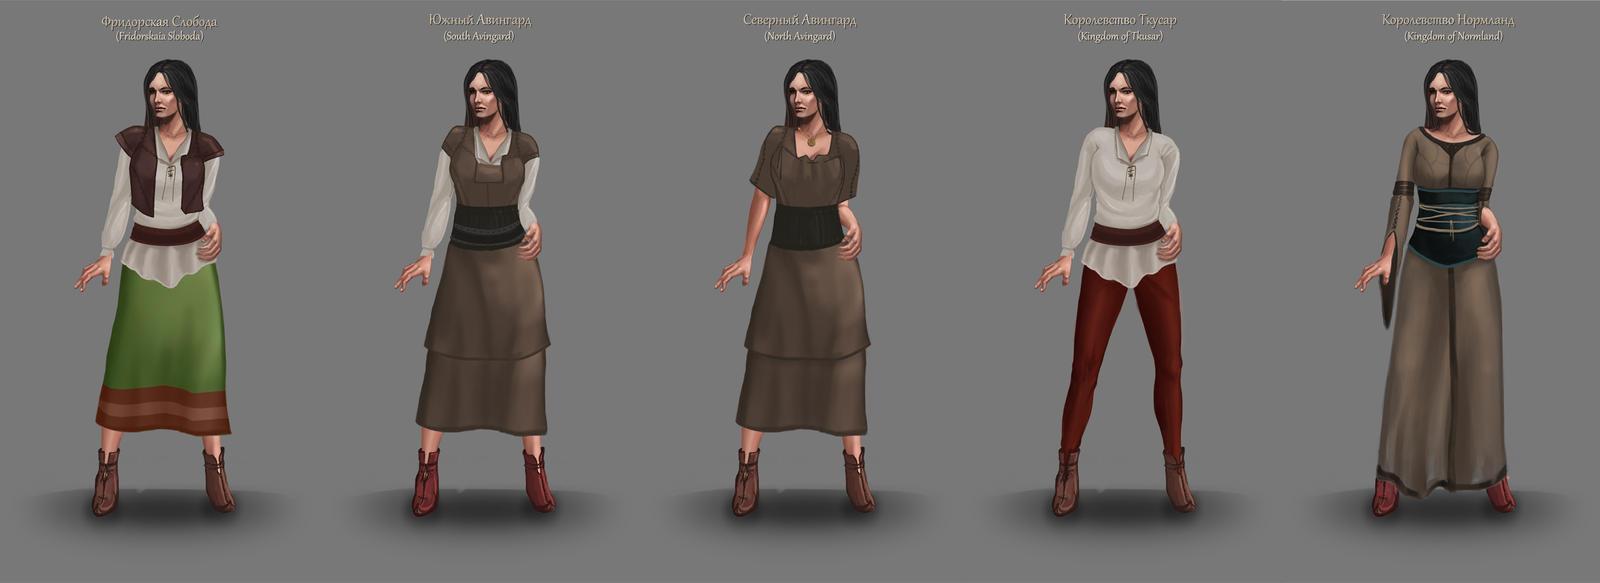 Dress of the Tiarit Citizen by Igor-Esaulov